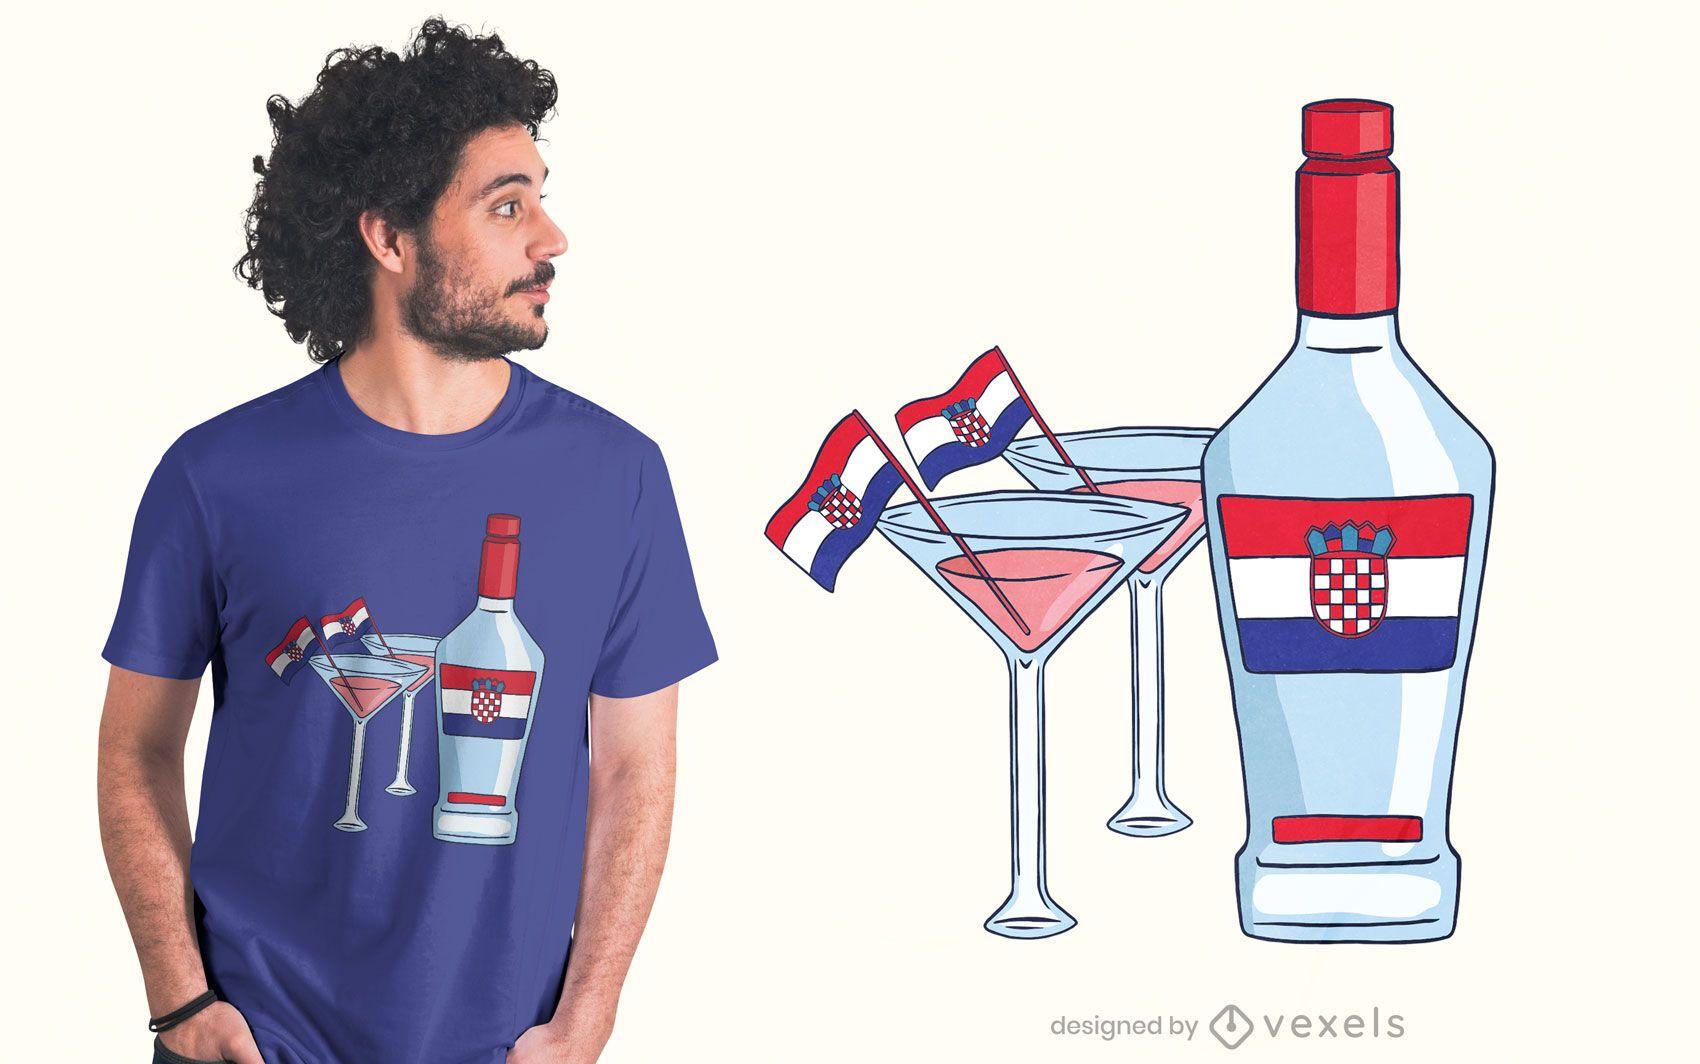 Croatia martini t-shirt design